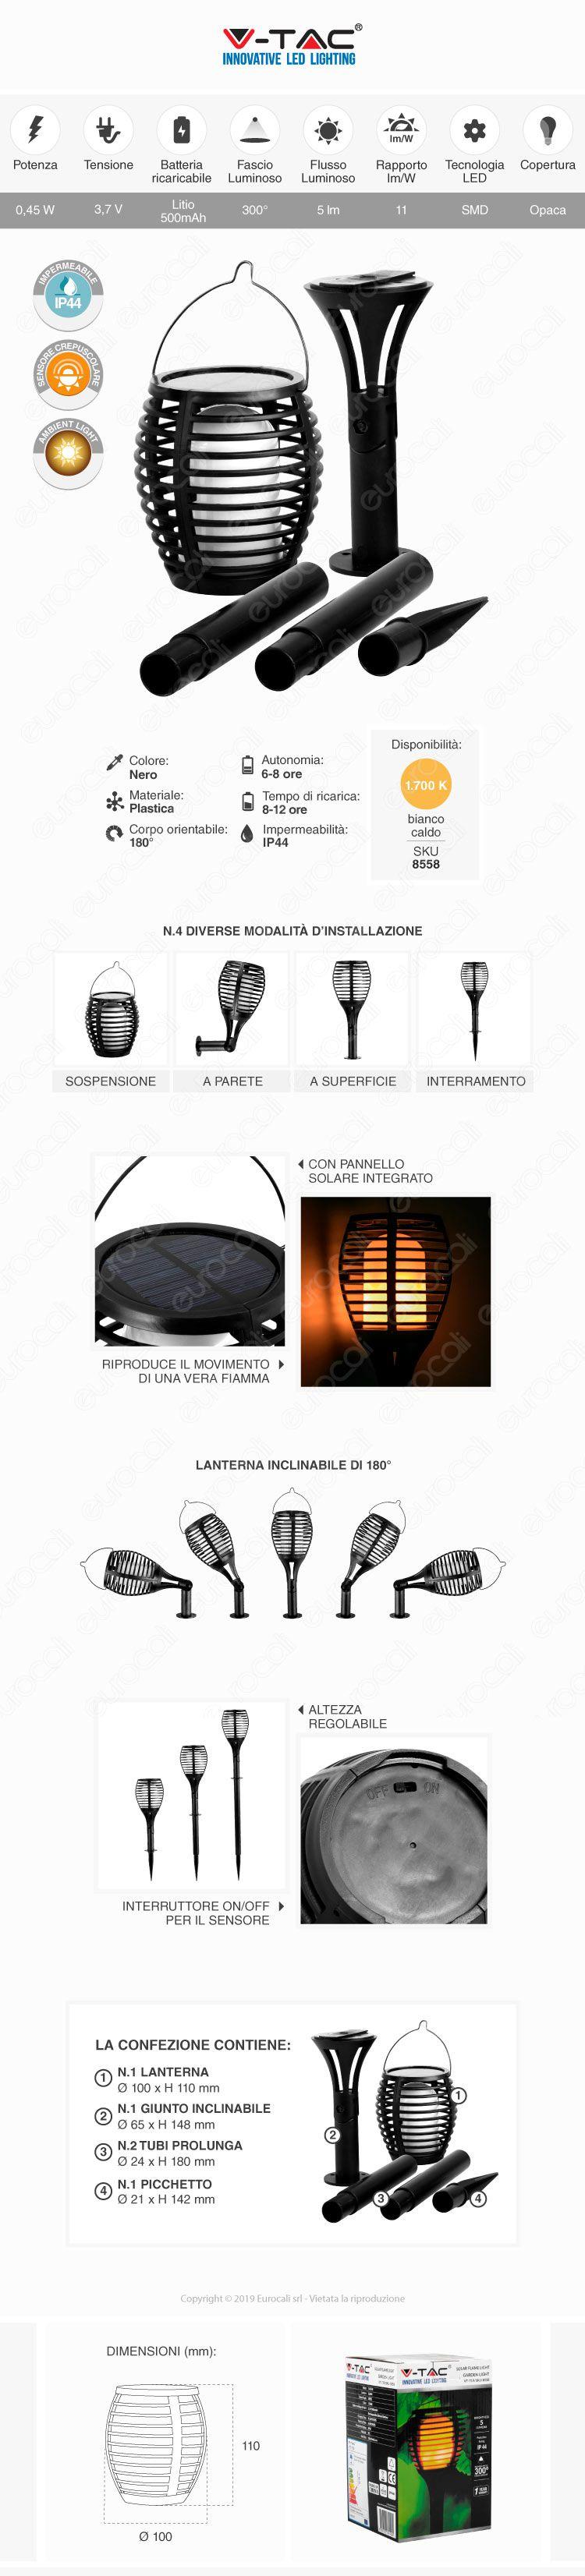 Lanterna da Giardino con Luce LED e Pannello Solare V-Tac VT-719